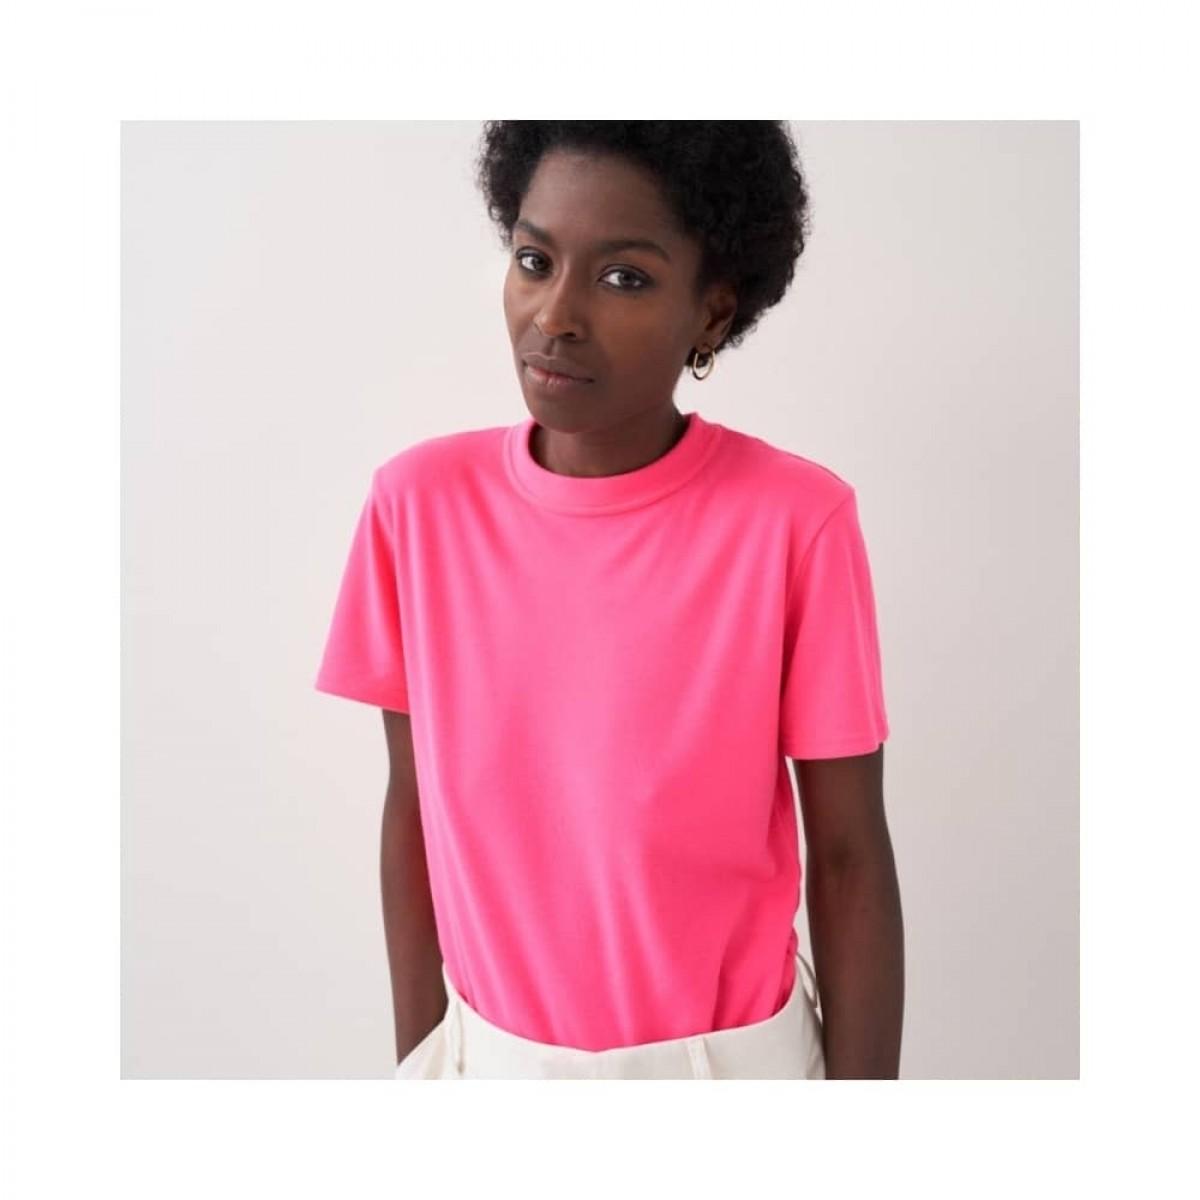 mia t-shirt - neon pink